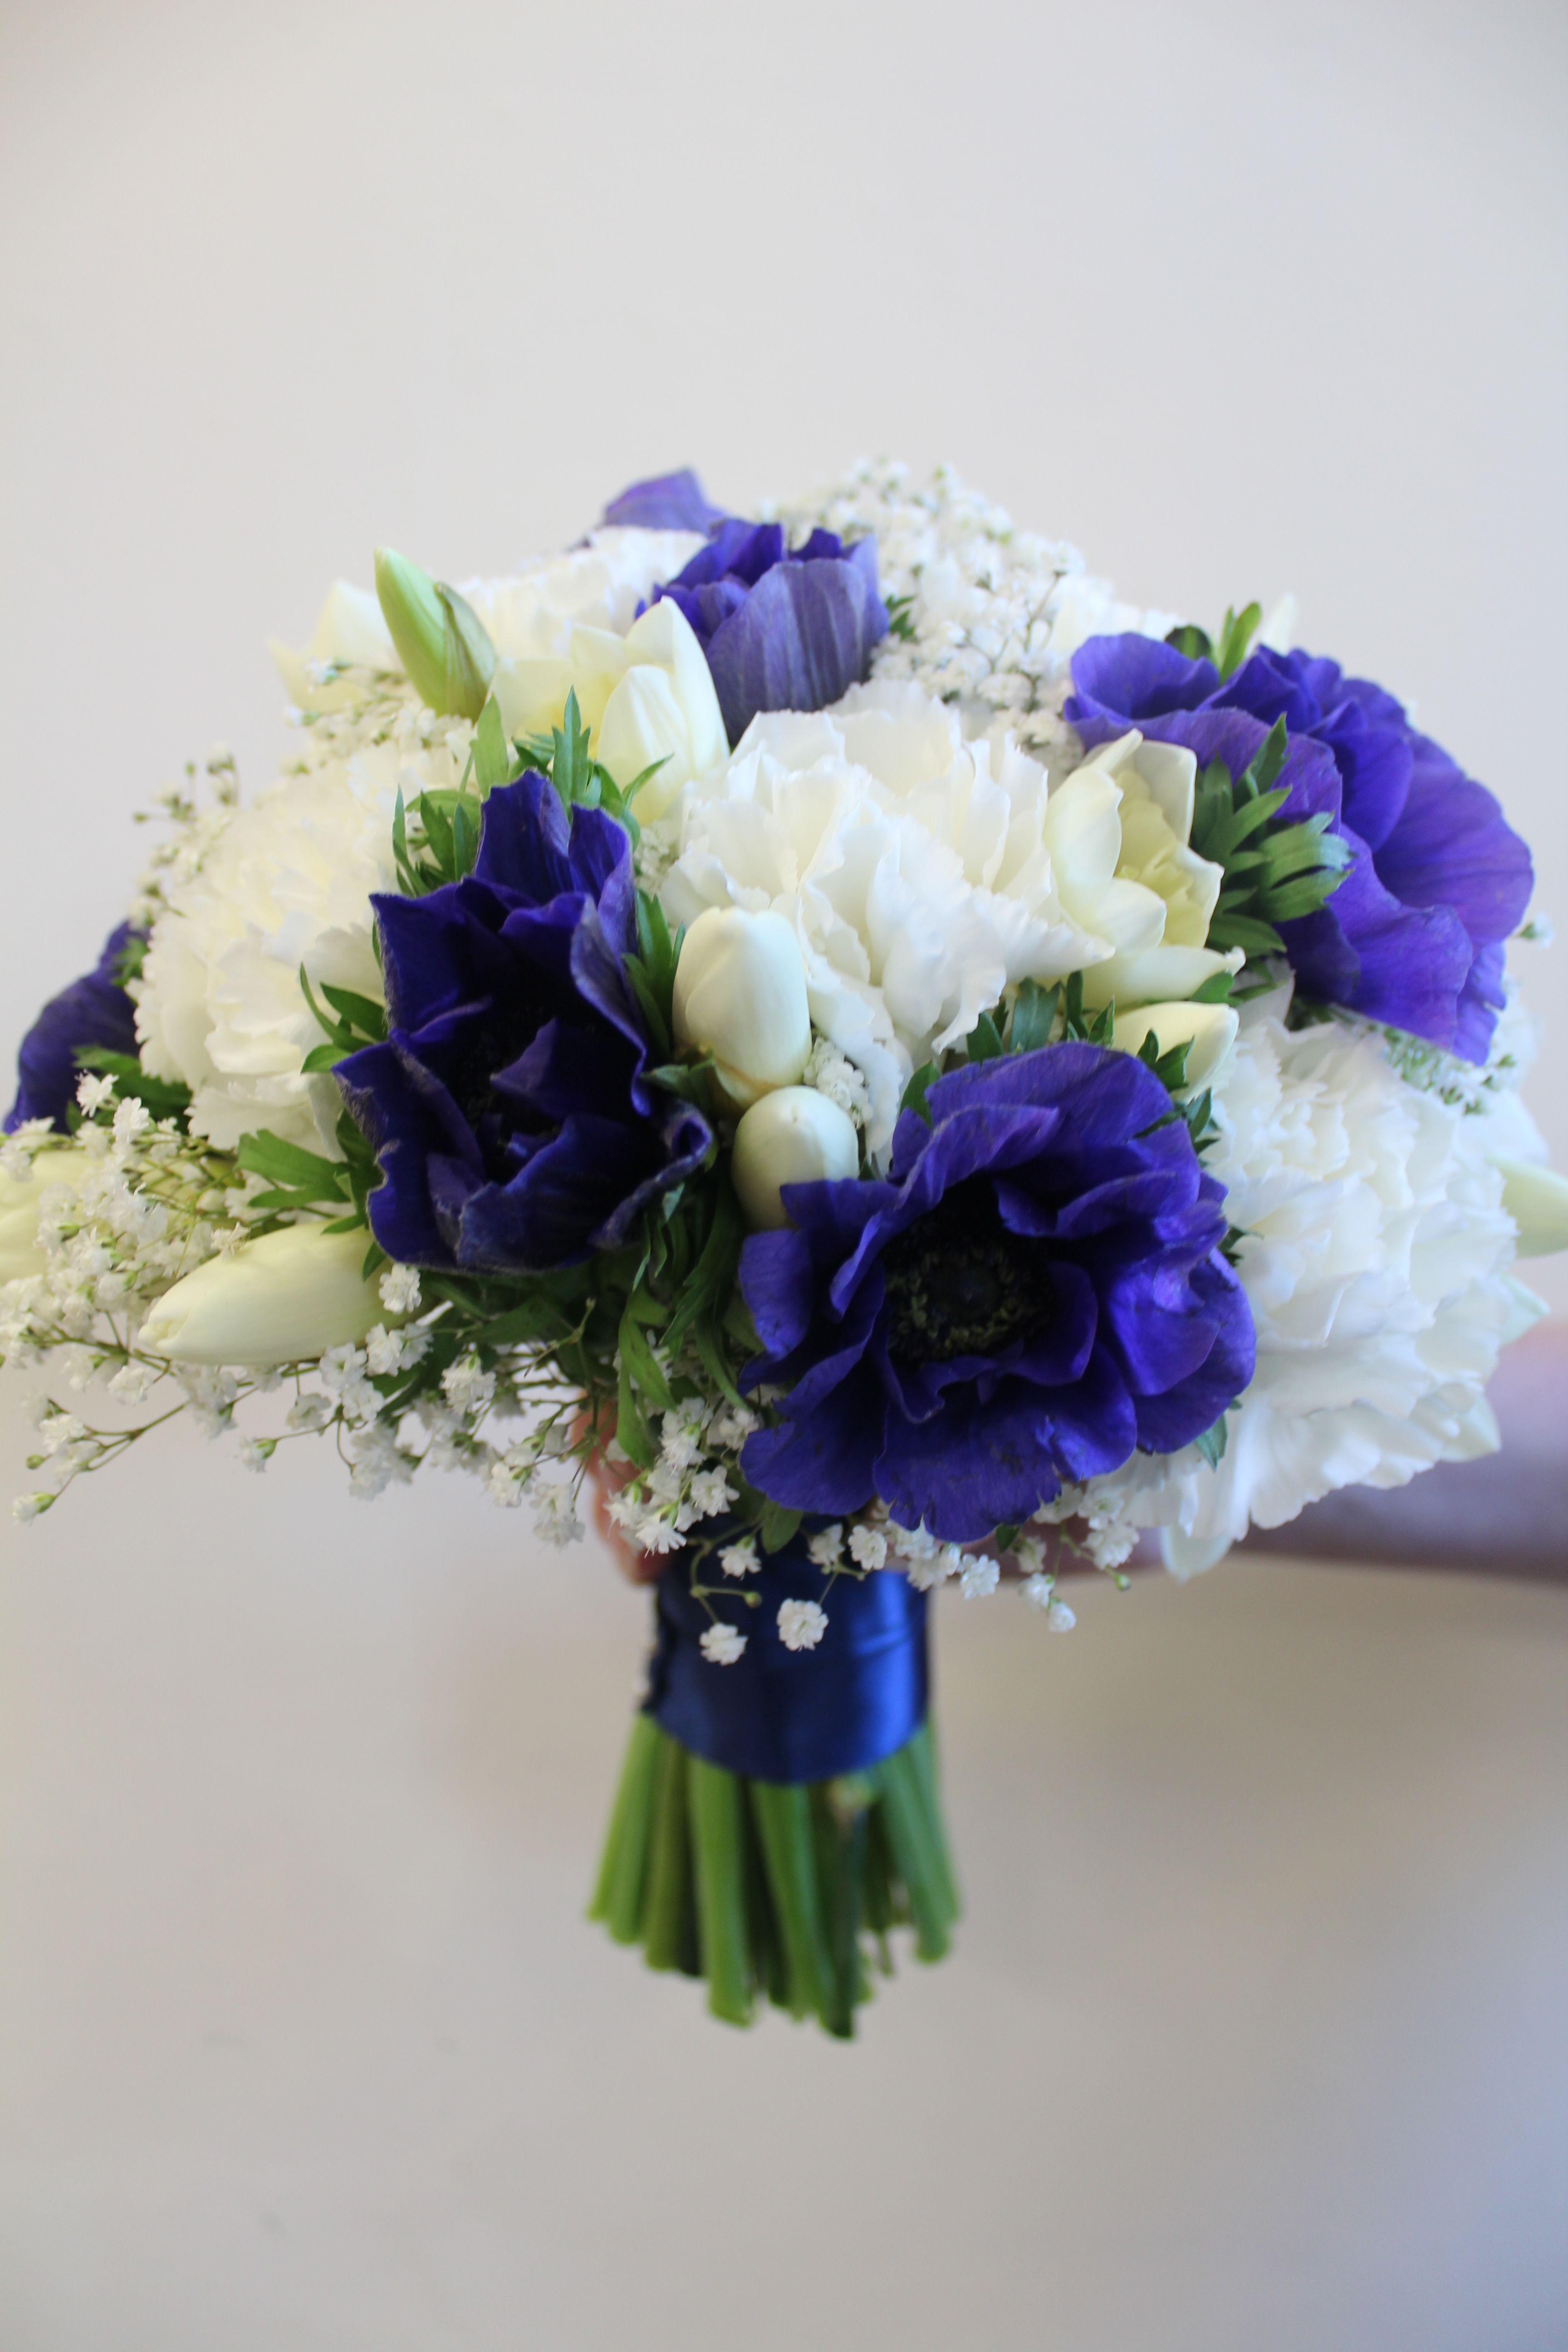 Wedding bouquet in navy blue and white anemones wedding flowers wedding bouquet in navy blue and white anemones izmirmasajfo